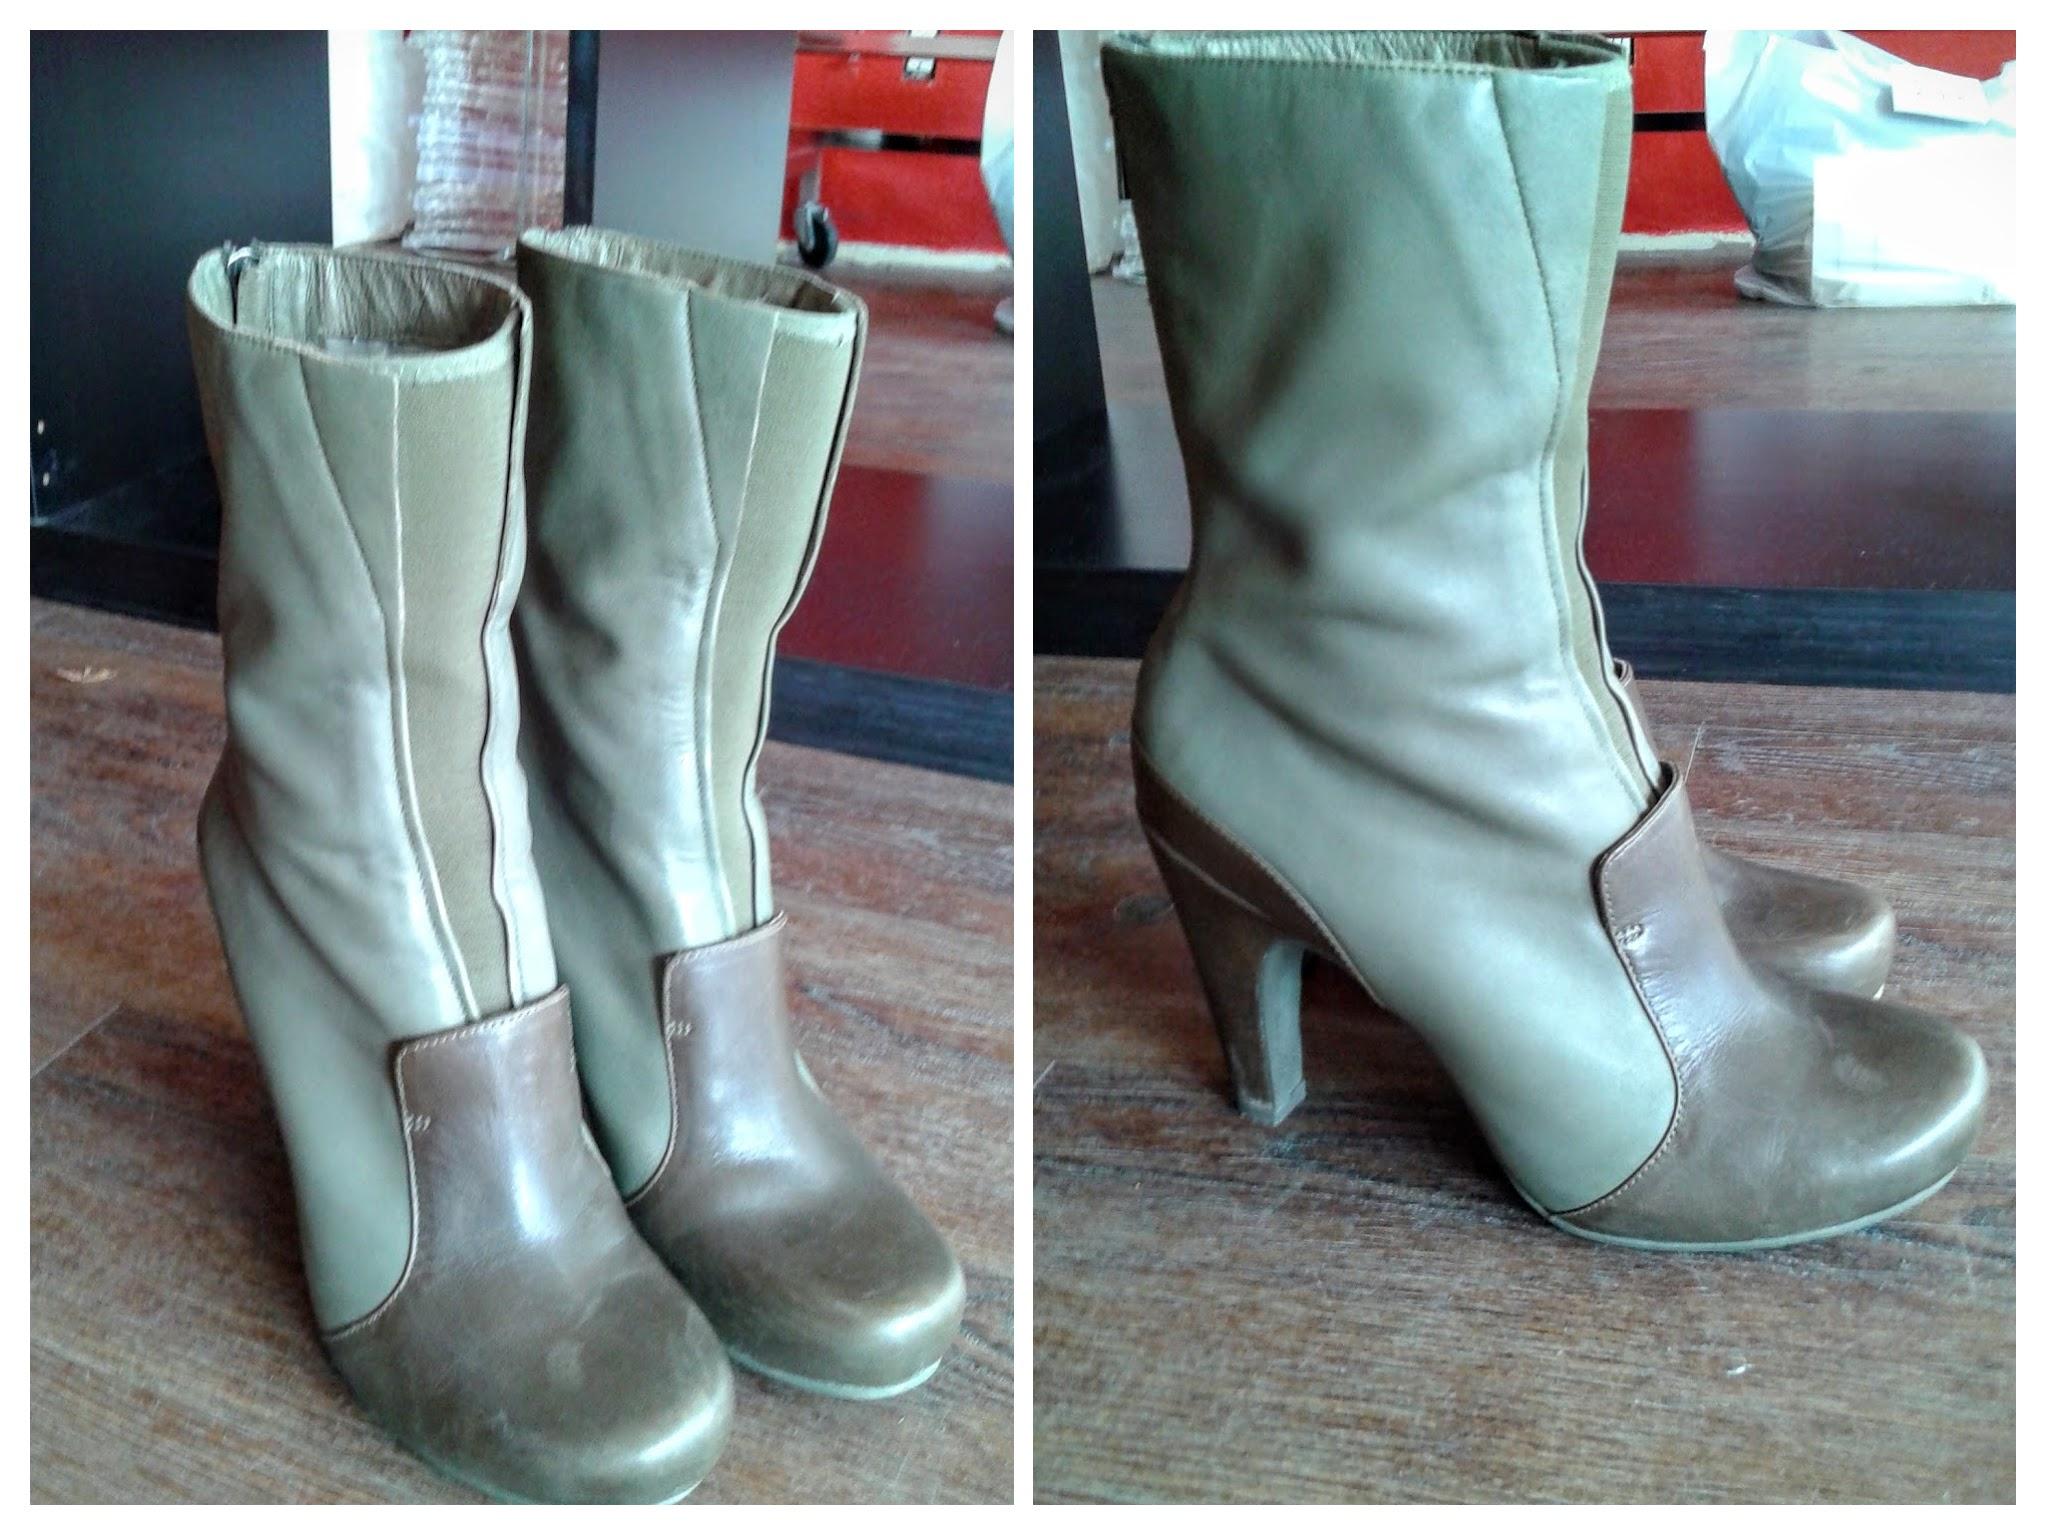 Green Tsubo boots!